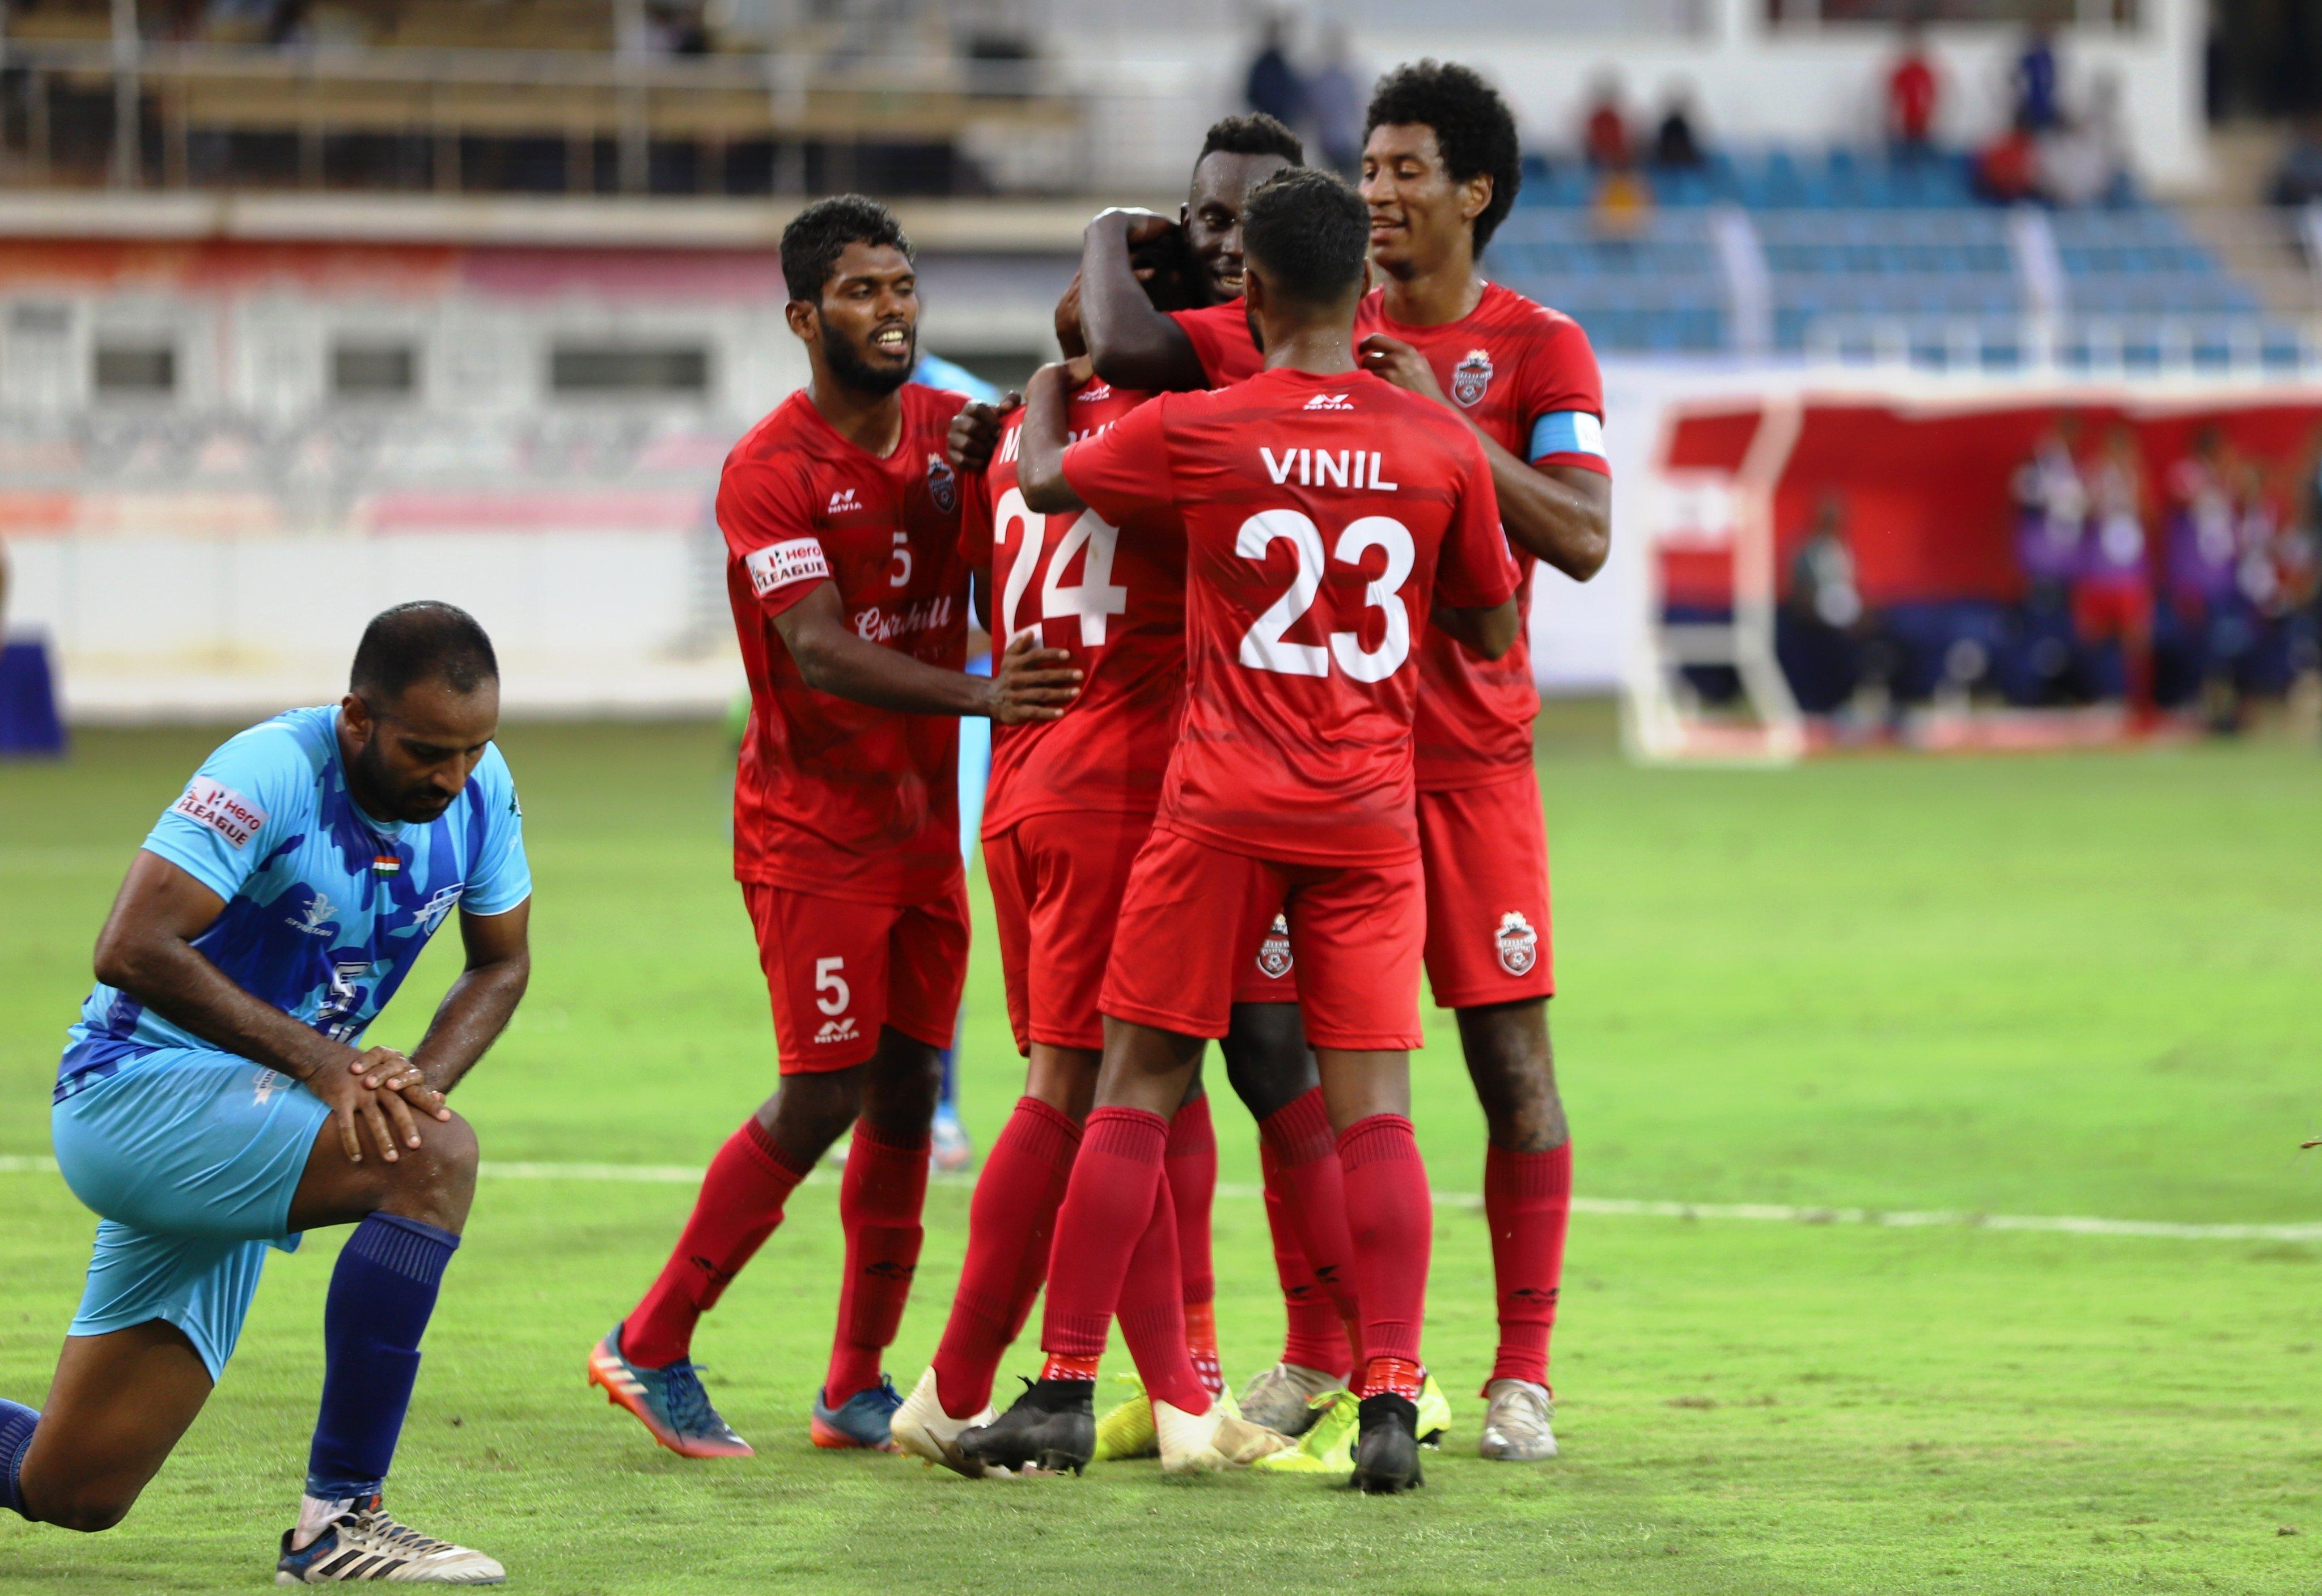 I-League 2019-20 Round 1